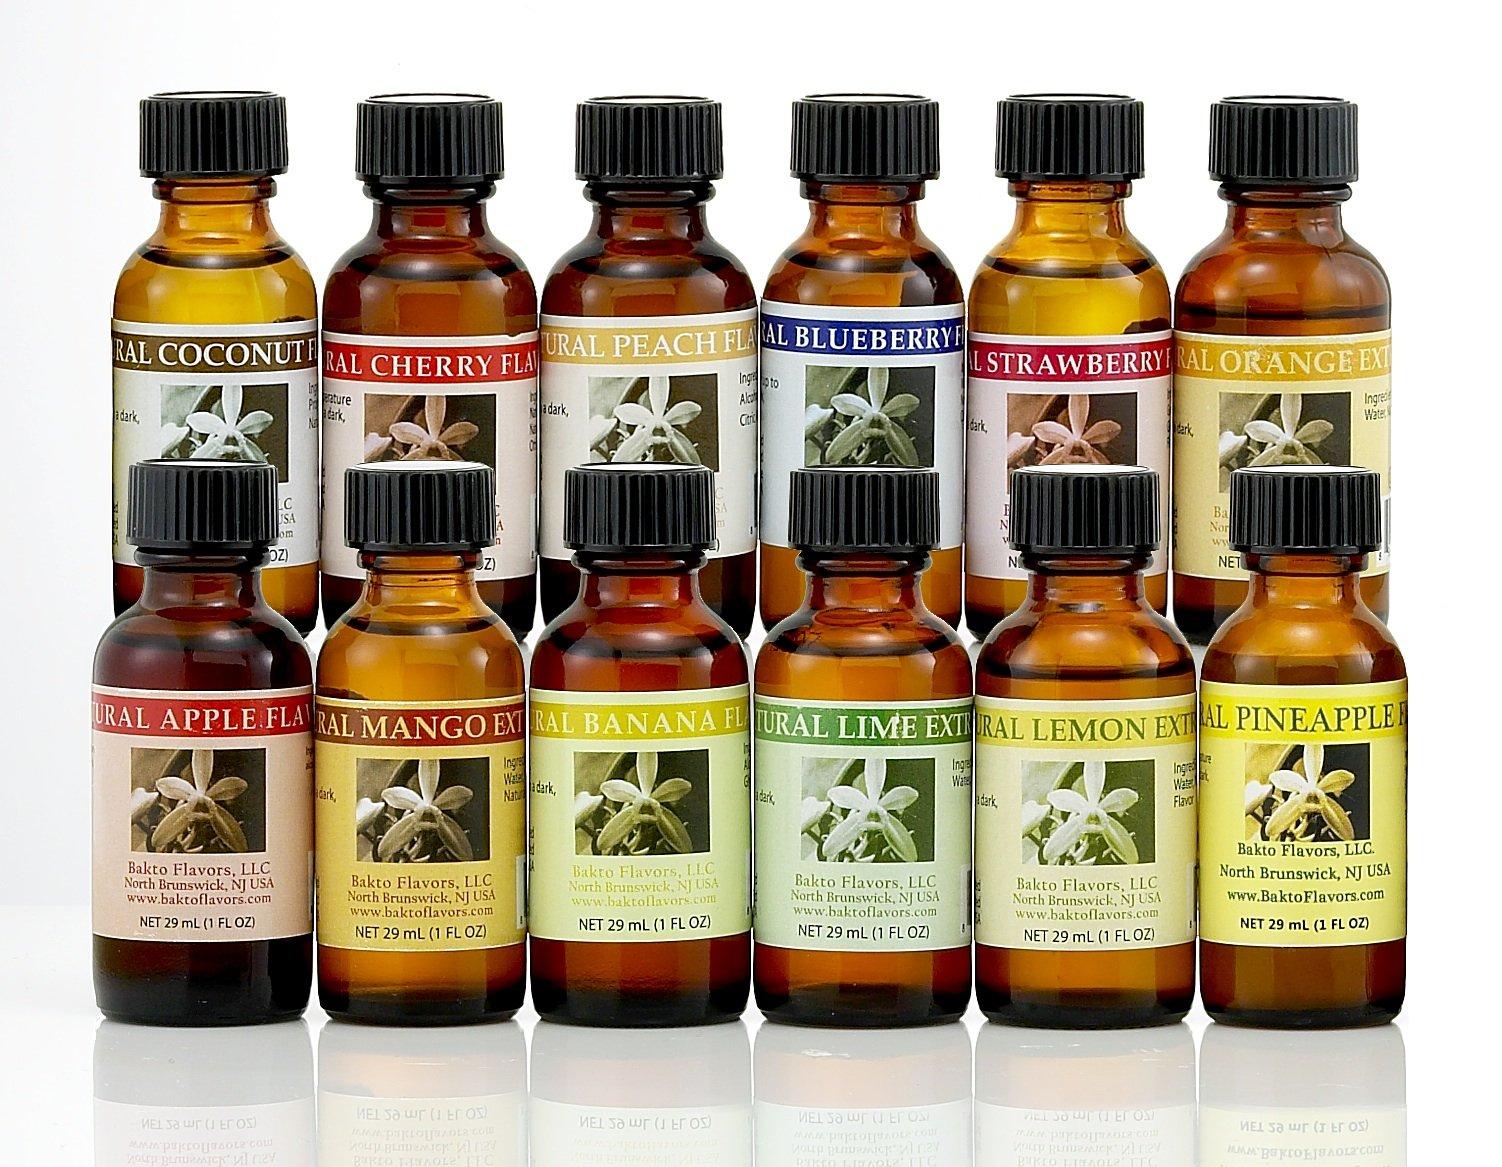 Bakto Flavors Natural Fruit Frenzy Collection - 1 FL OZ Bottles - Set of 12, Gift Box